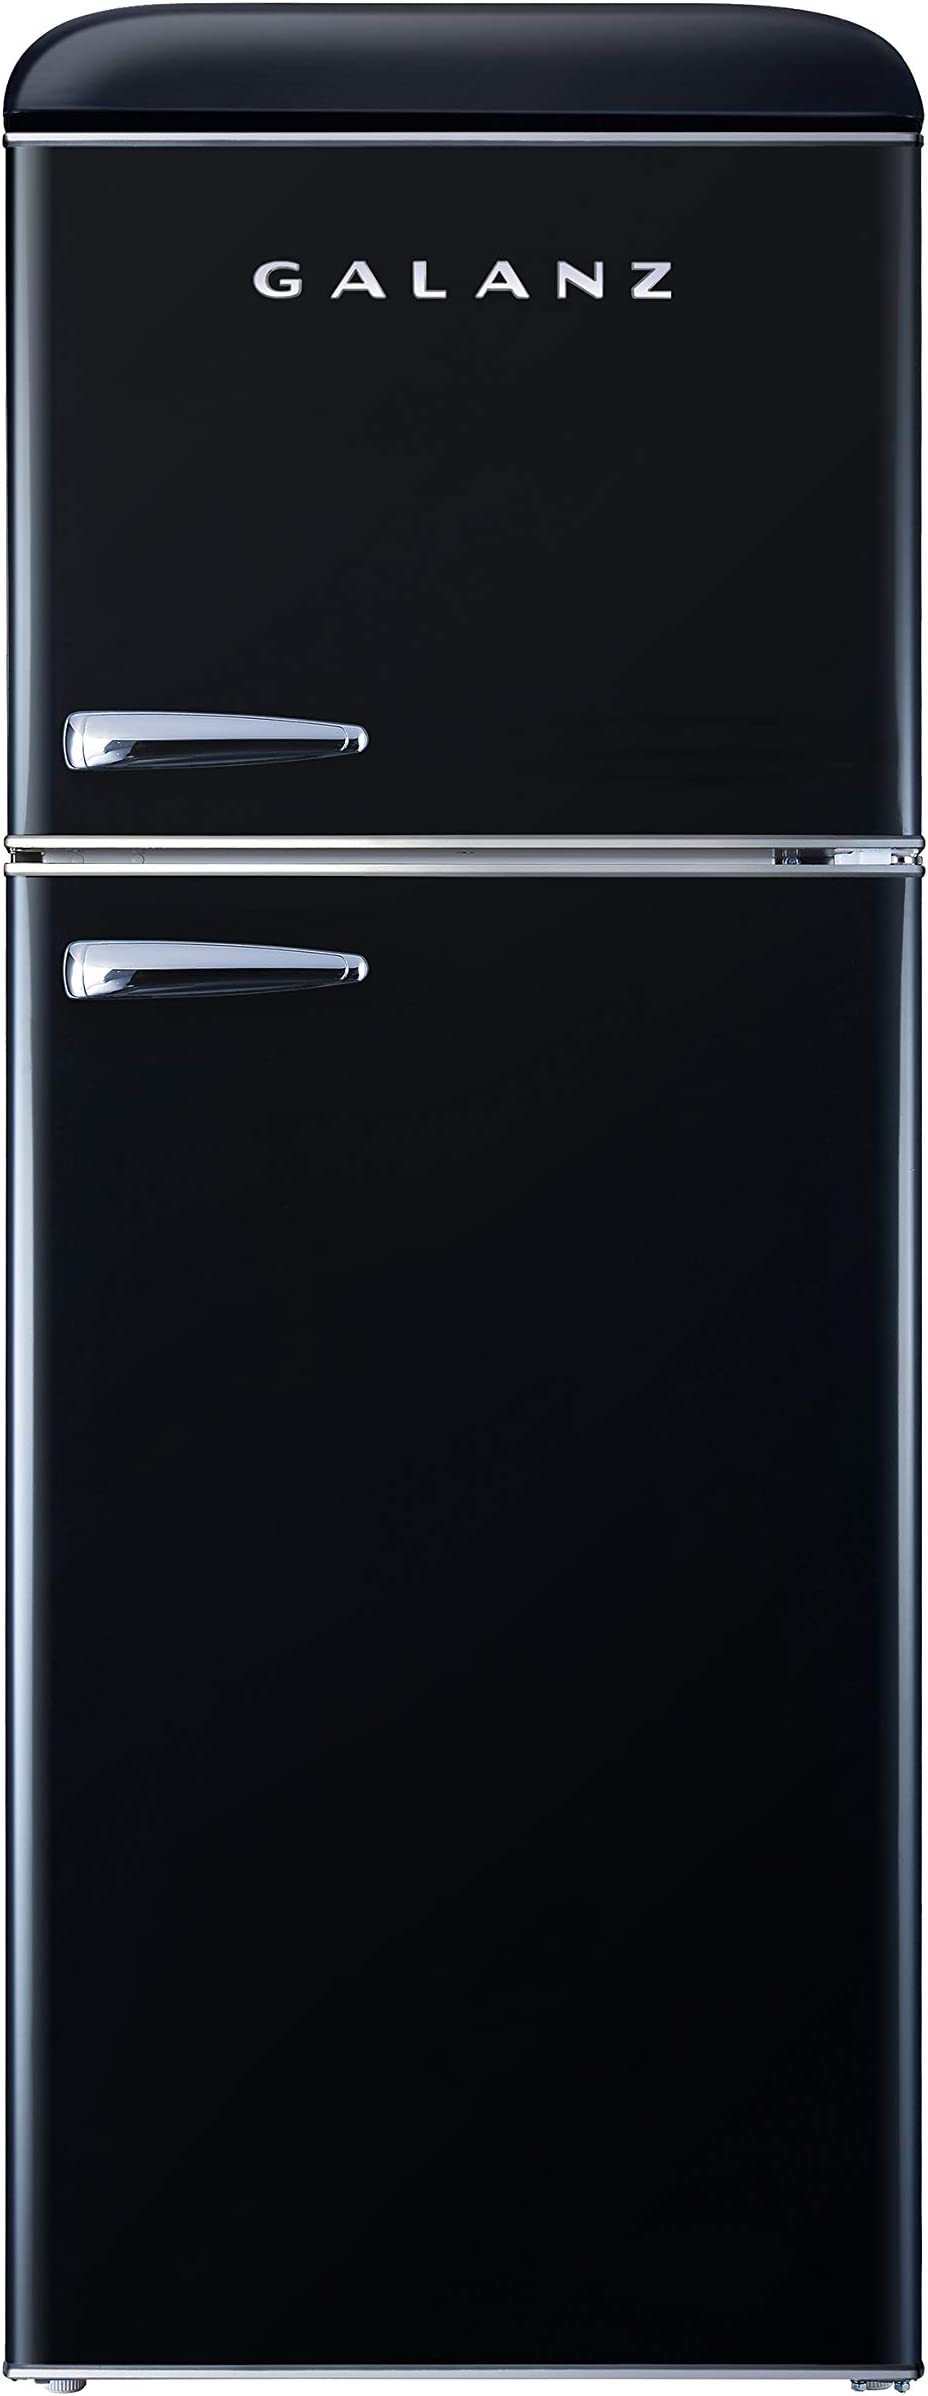 Galanz GLR46TBKER Retro Compact Refrigerator, 4.6 Cu.Ft Mini Fridge with Dual Door, Adjustable Mechanical Thermostat with True Freezer, Black